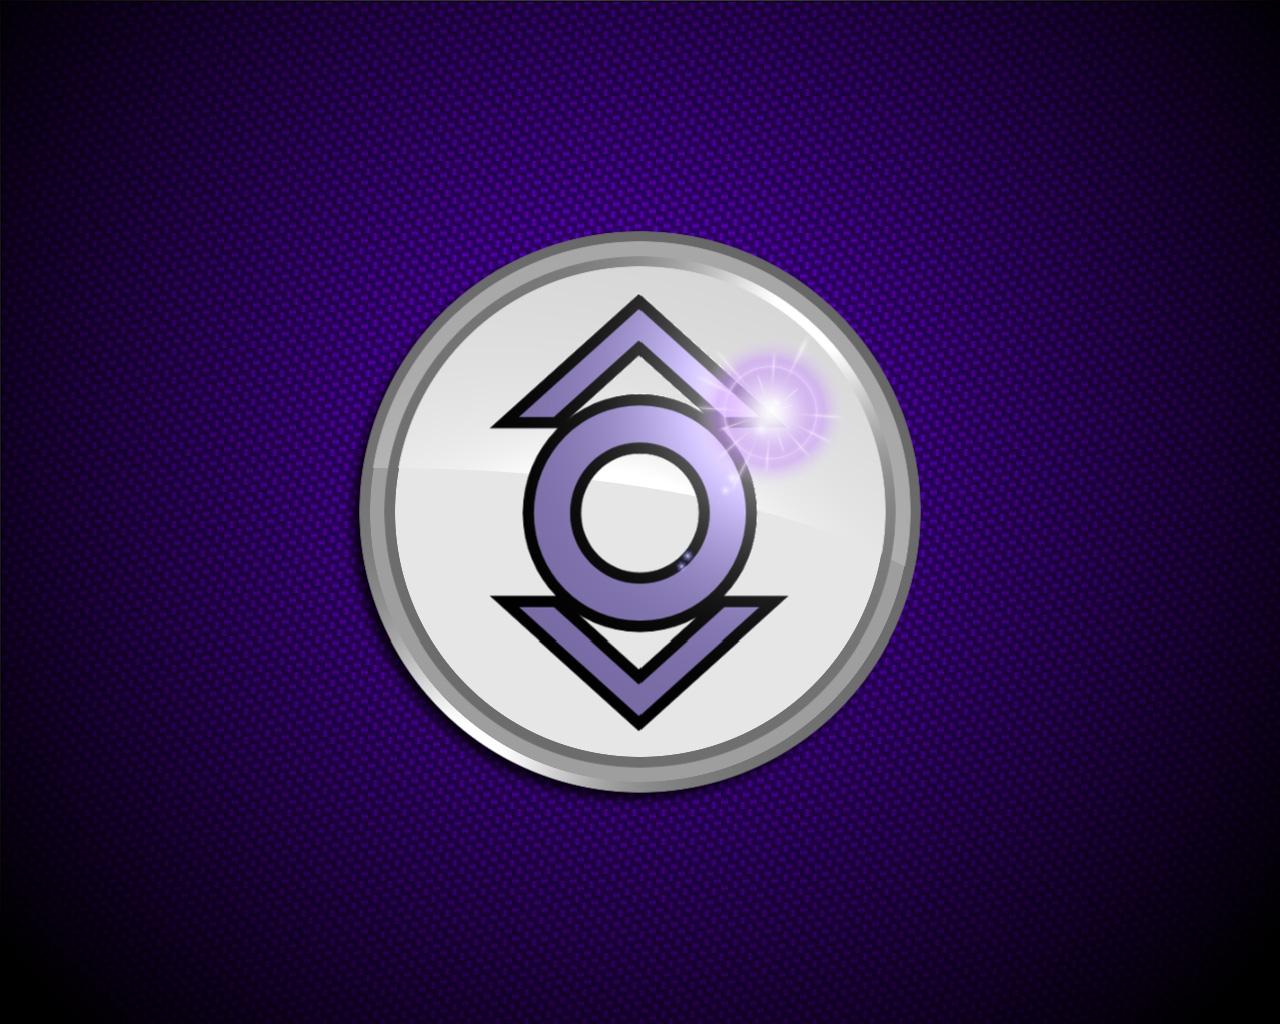 Indigo lantern corps symbol - photo#17